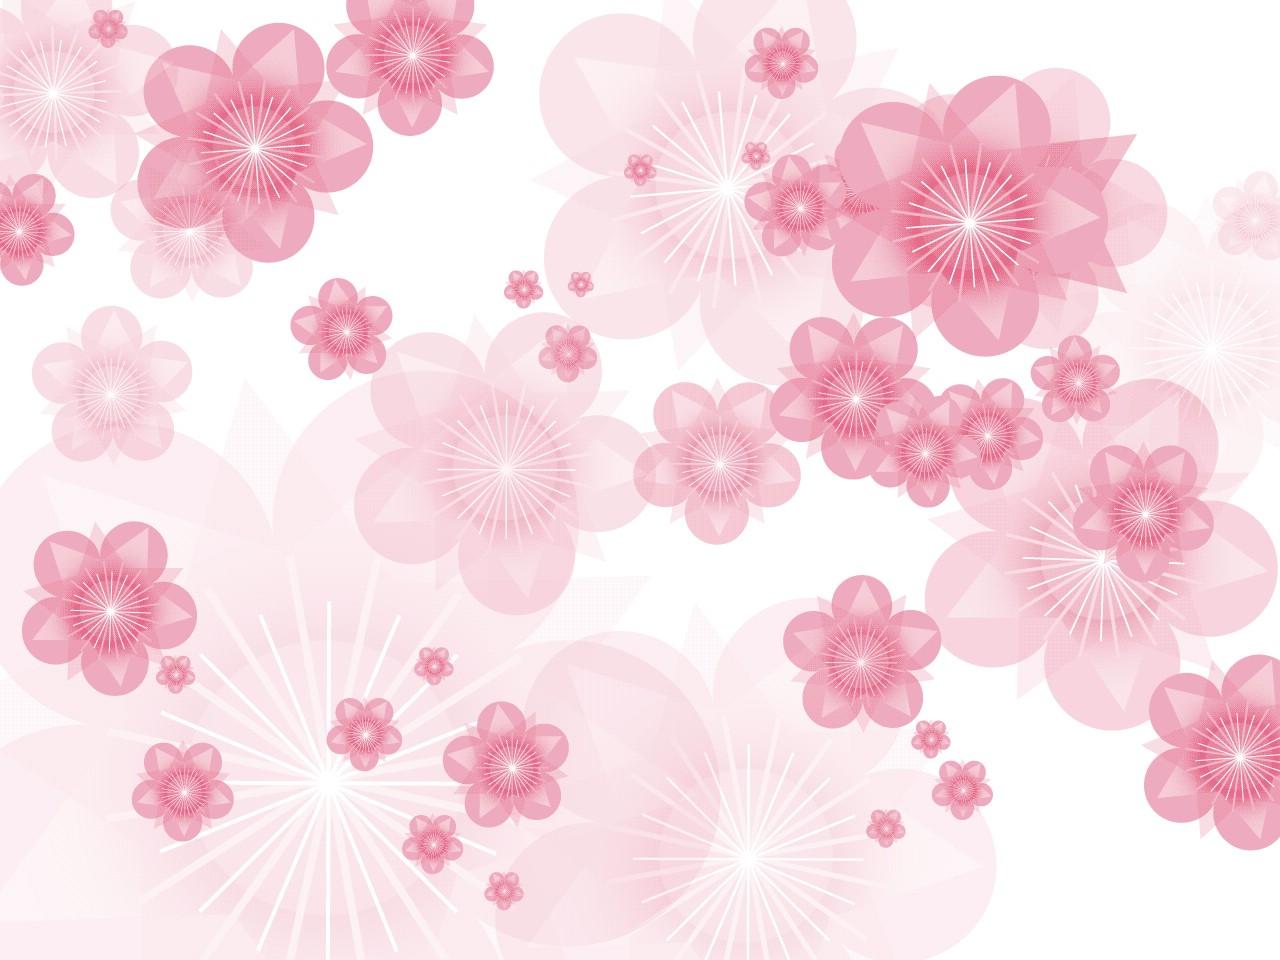 1280x960px pink flower background wallpapersafari pink flower background tumblr wallpaper pink flower background 1280x960 mightylinksfo